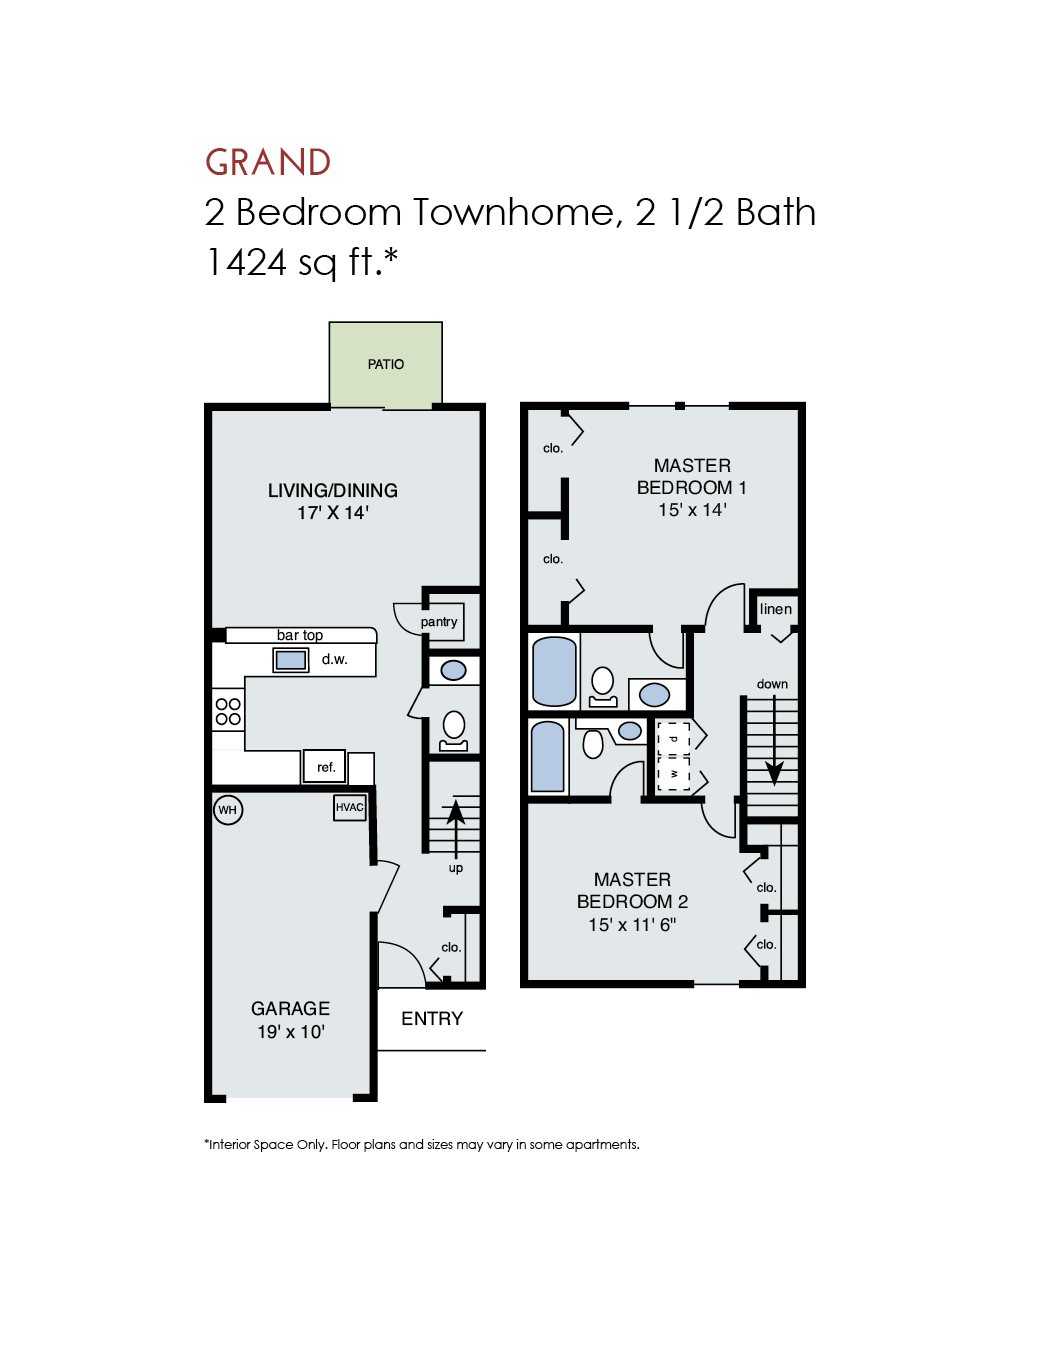 Grand - 2 Bedroom Townhome w Garage